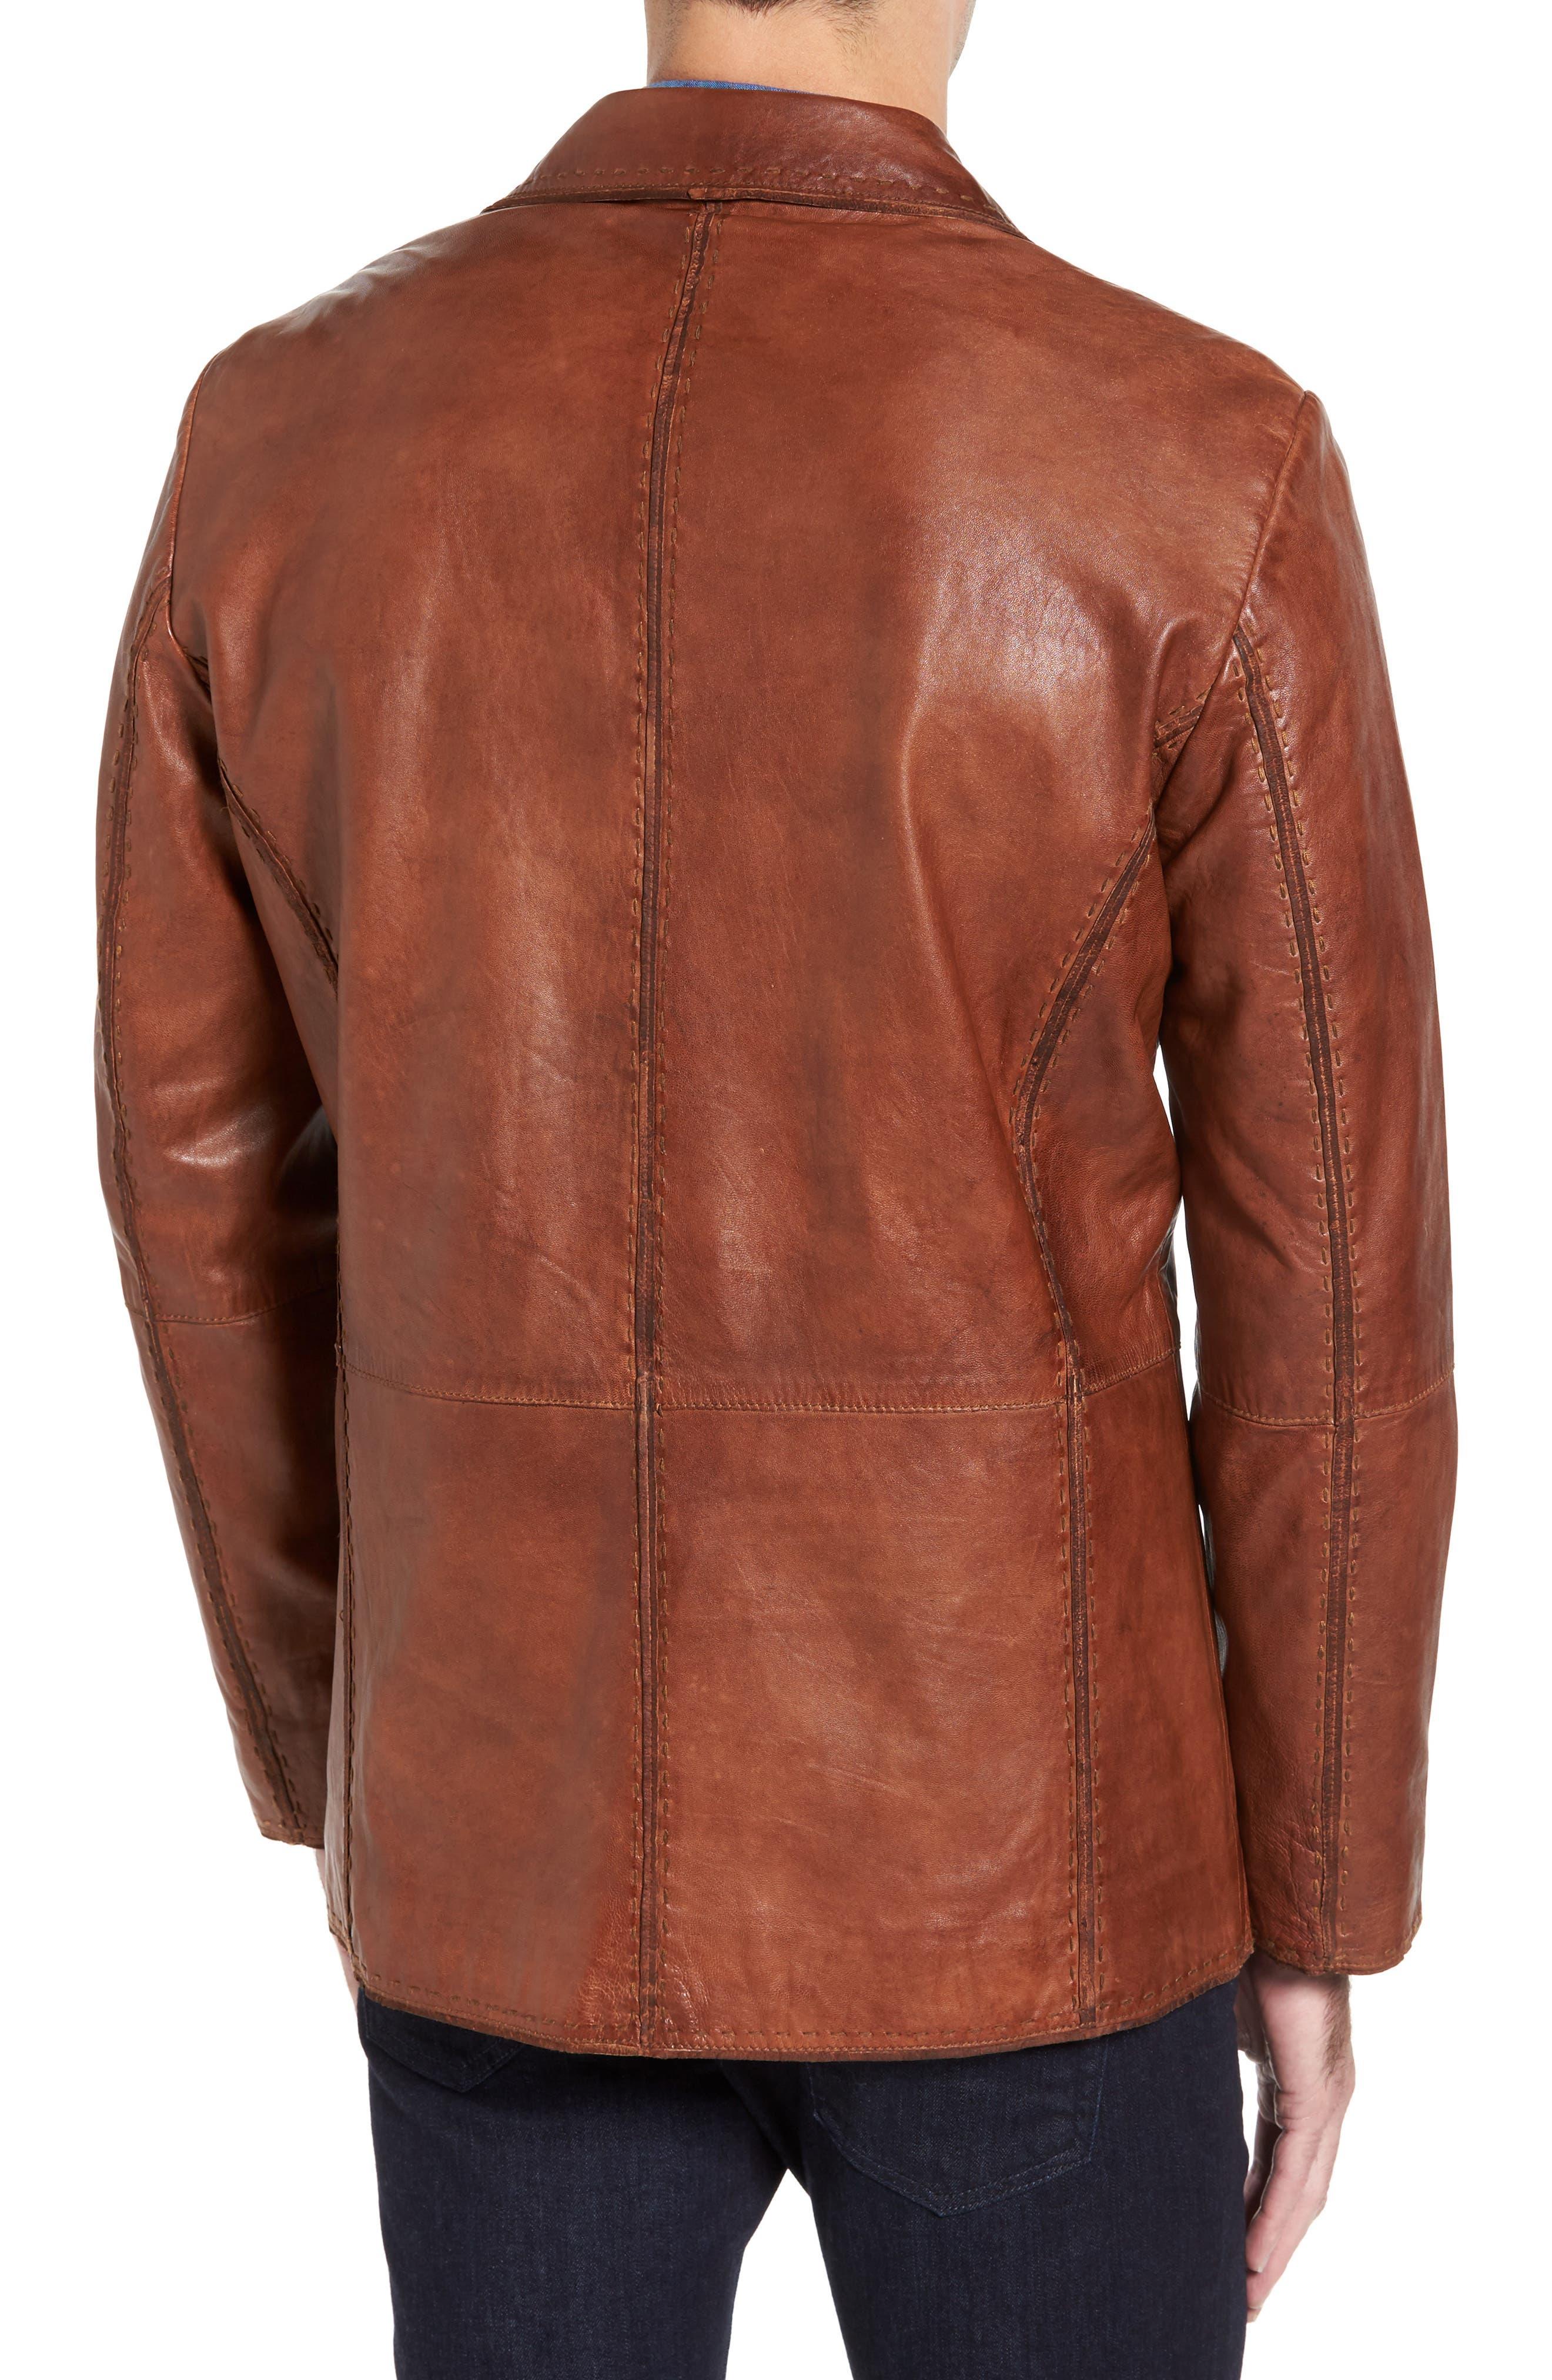 Lamb Leather Blazer,                             Alternate thumbnail 2, color,                             210